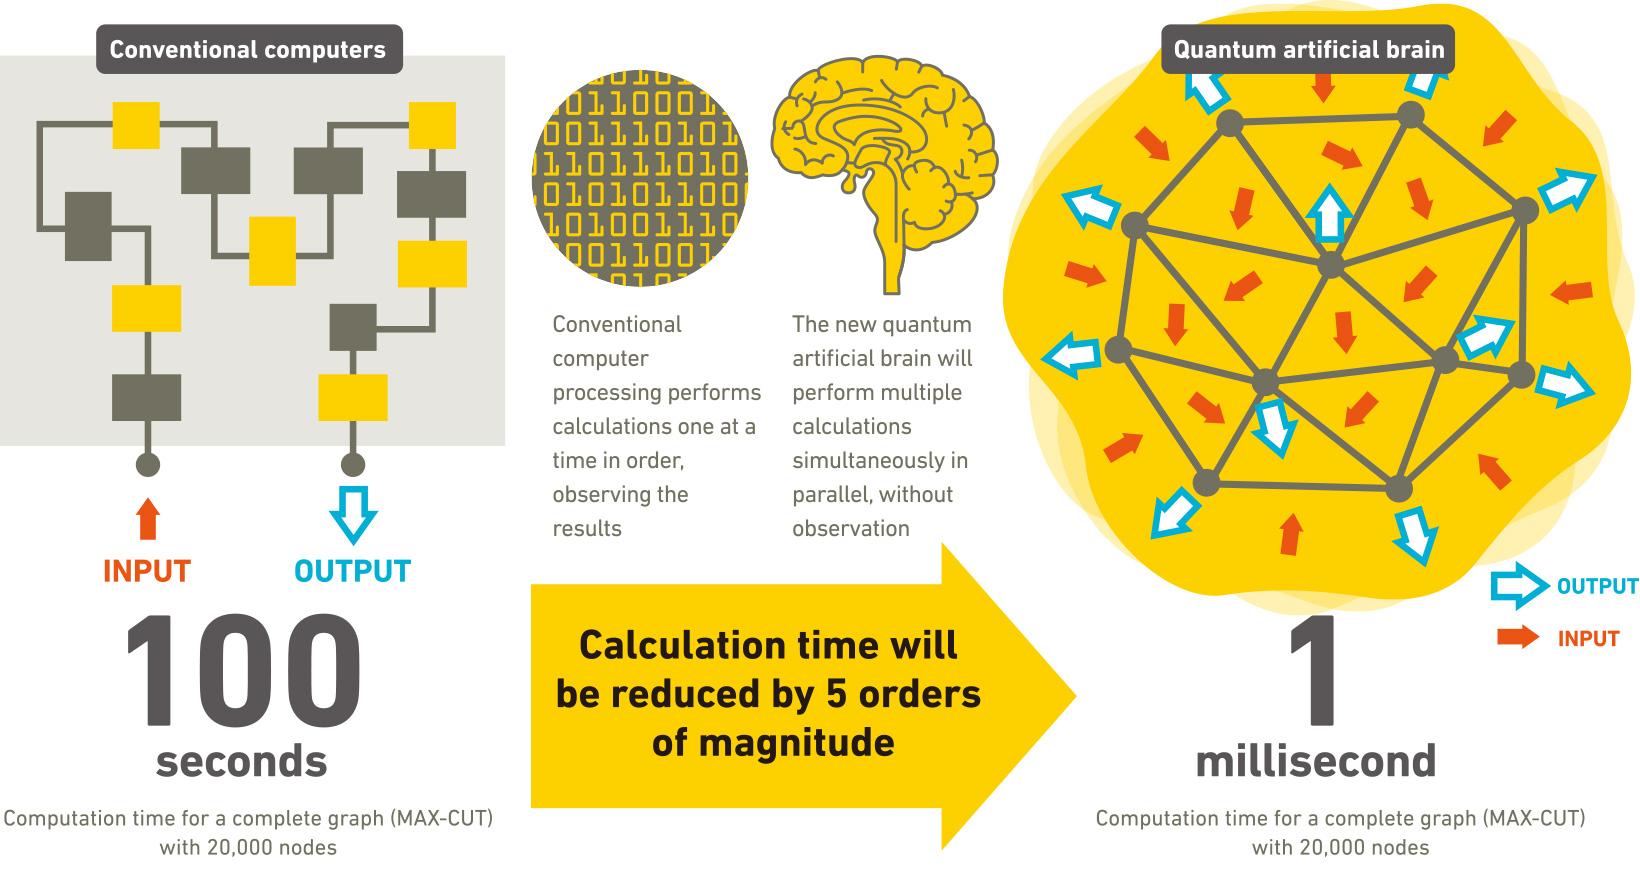 Impulsing Paradigm Change through Disruptive Technologies